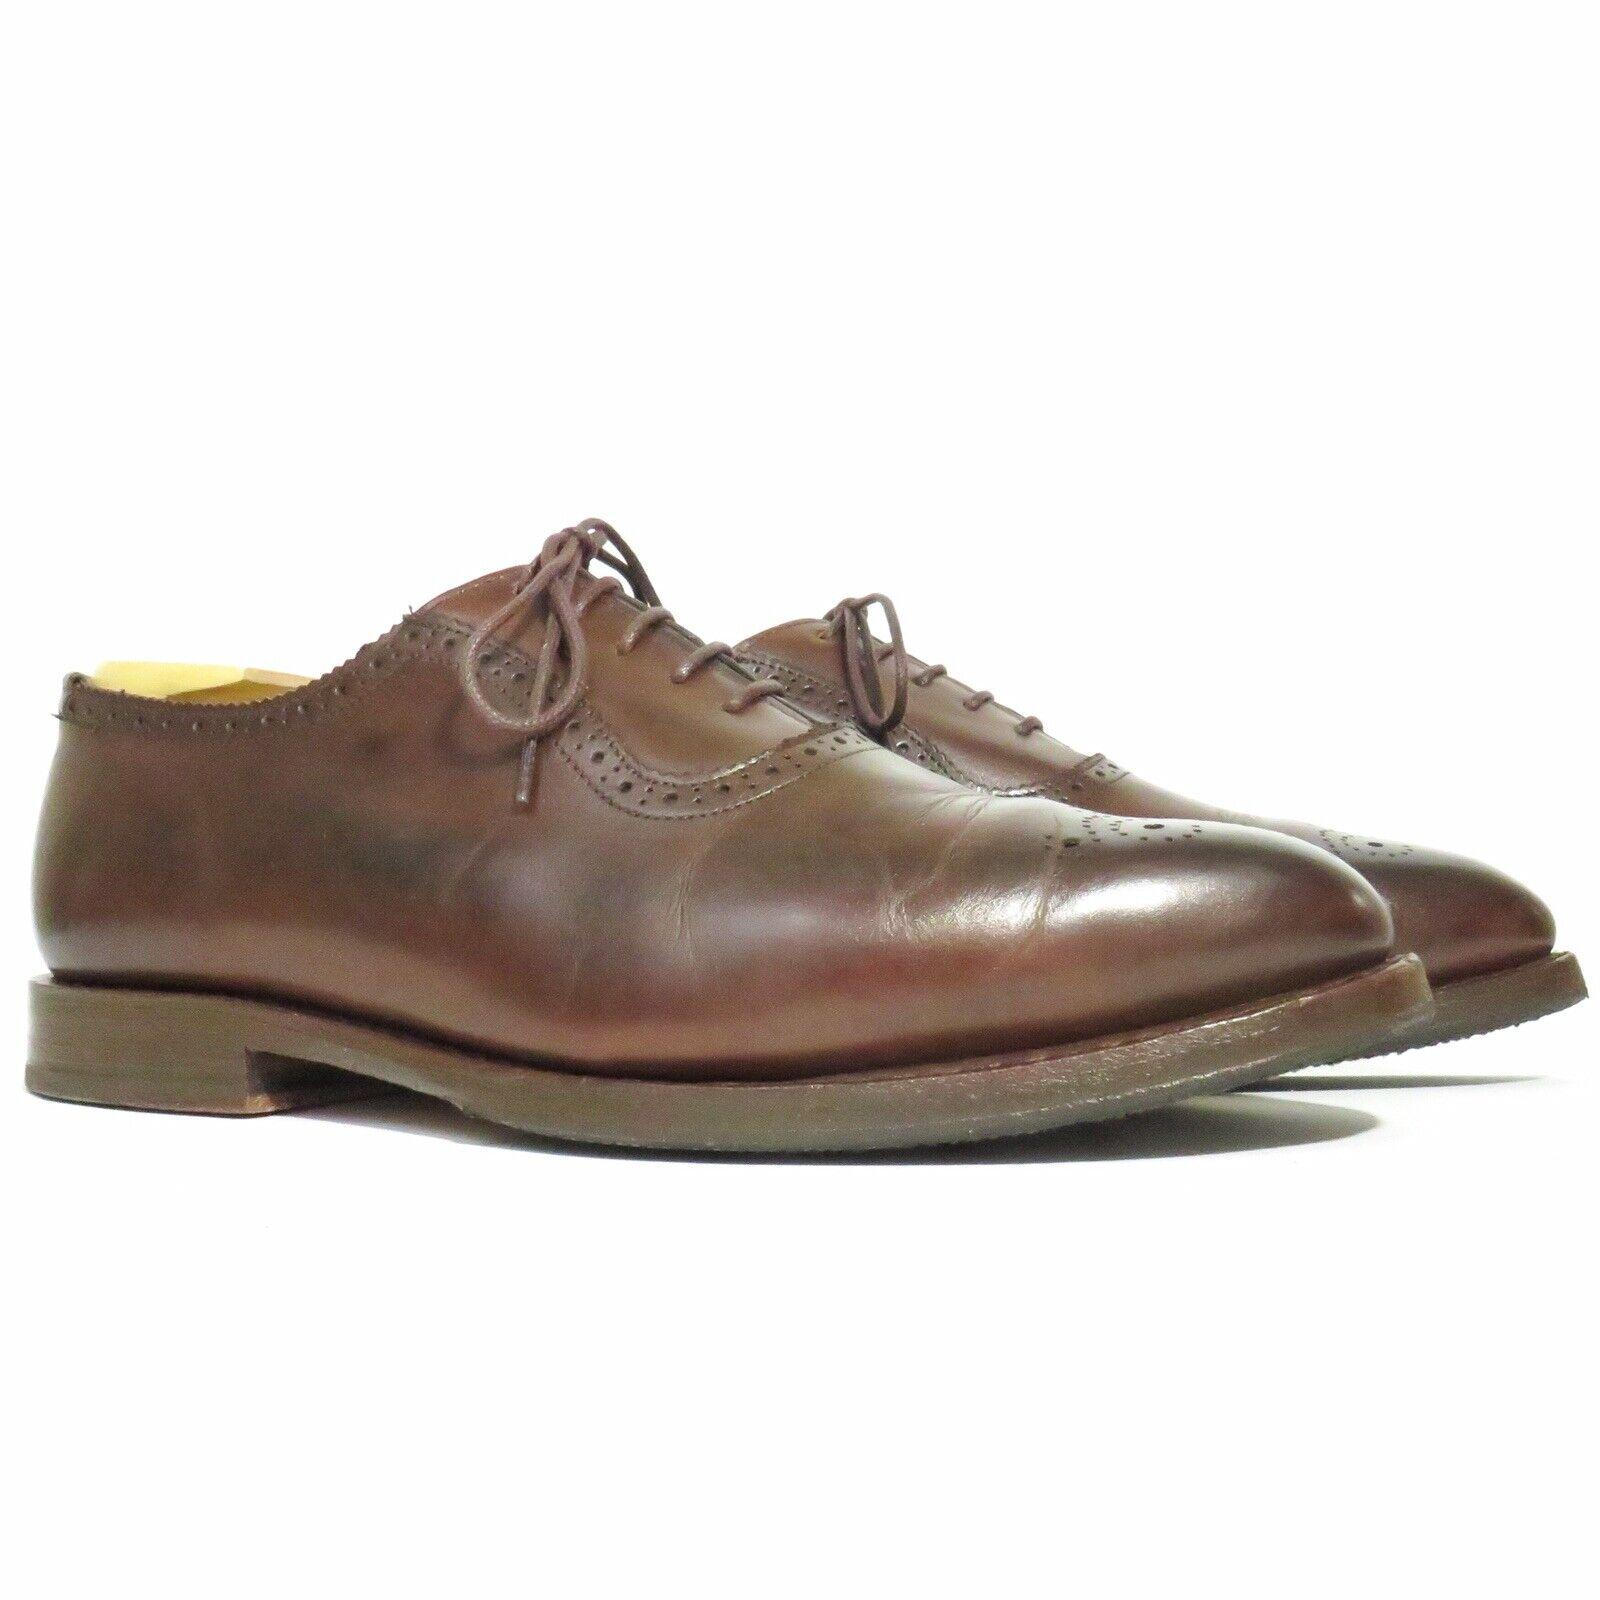 Allen Edmonds Premier Marronee Charles  Street scarpe - US 8EEE - USA  confortevole